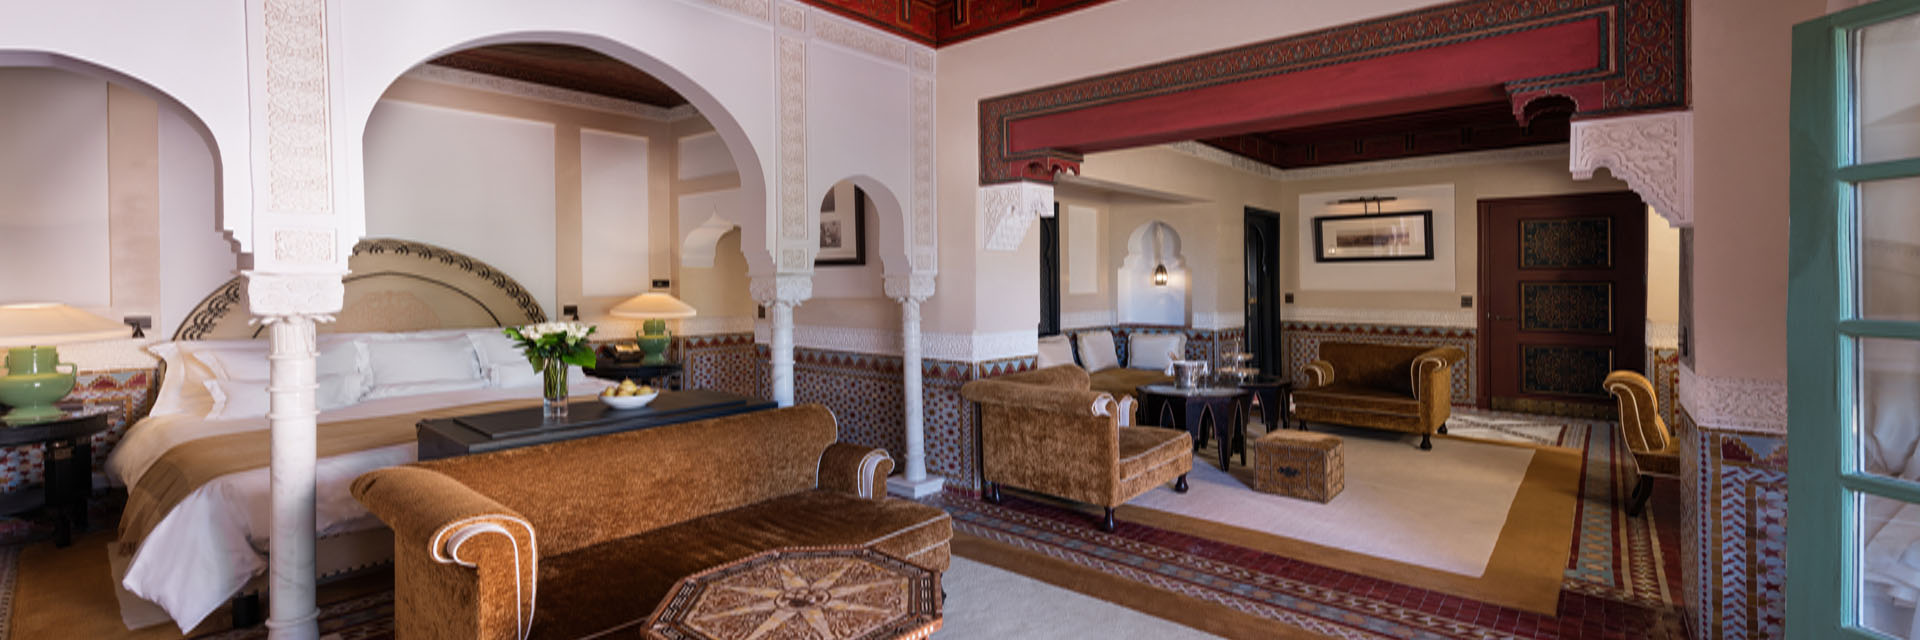 Suite Agdal, Room 144.  La Mamounia Hotel, Marrakech, Morocco. Photo by Alan Keohane www.still-images.net for La Mamounia